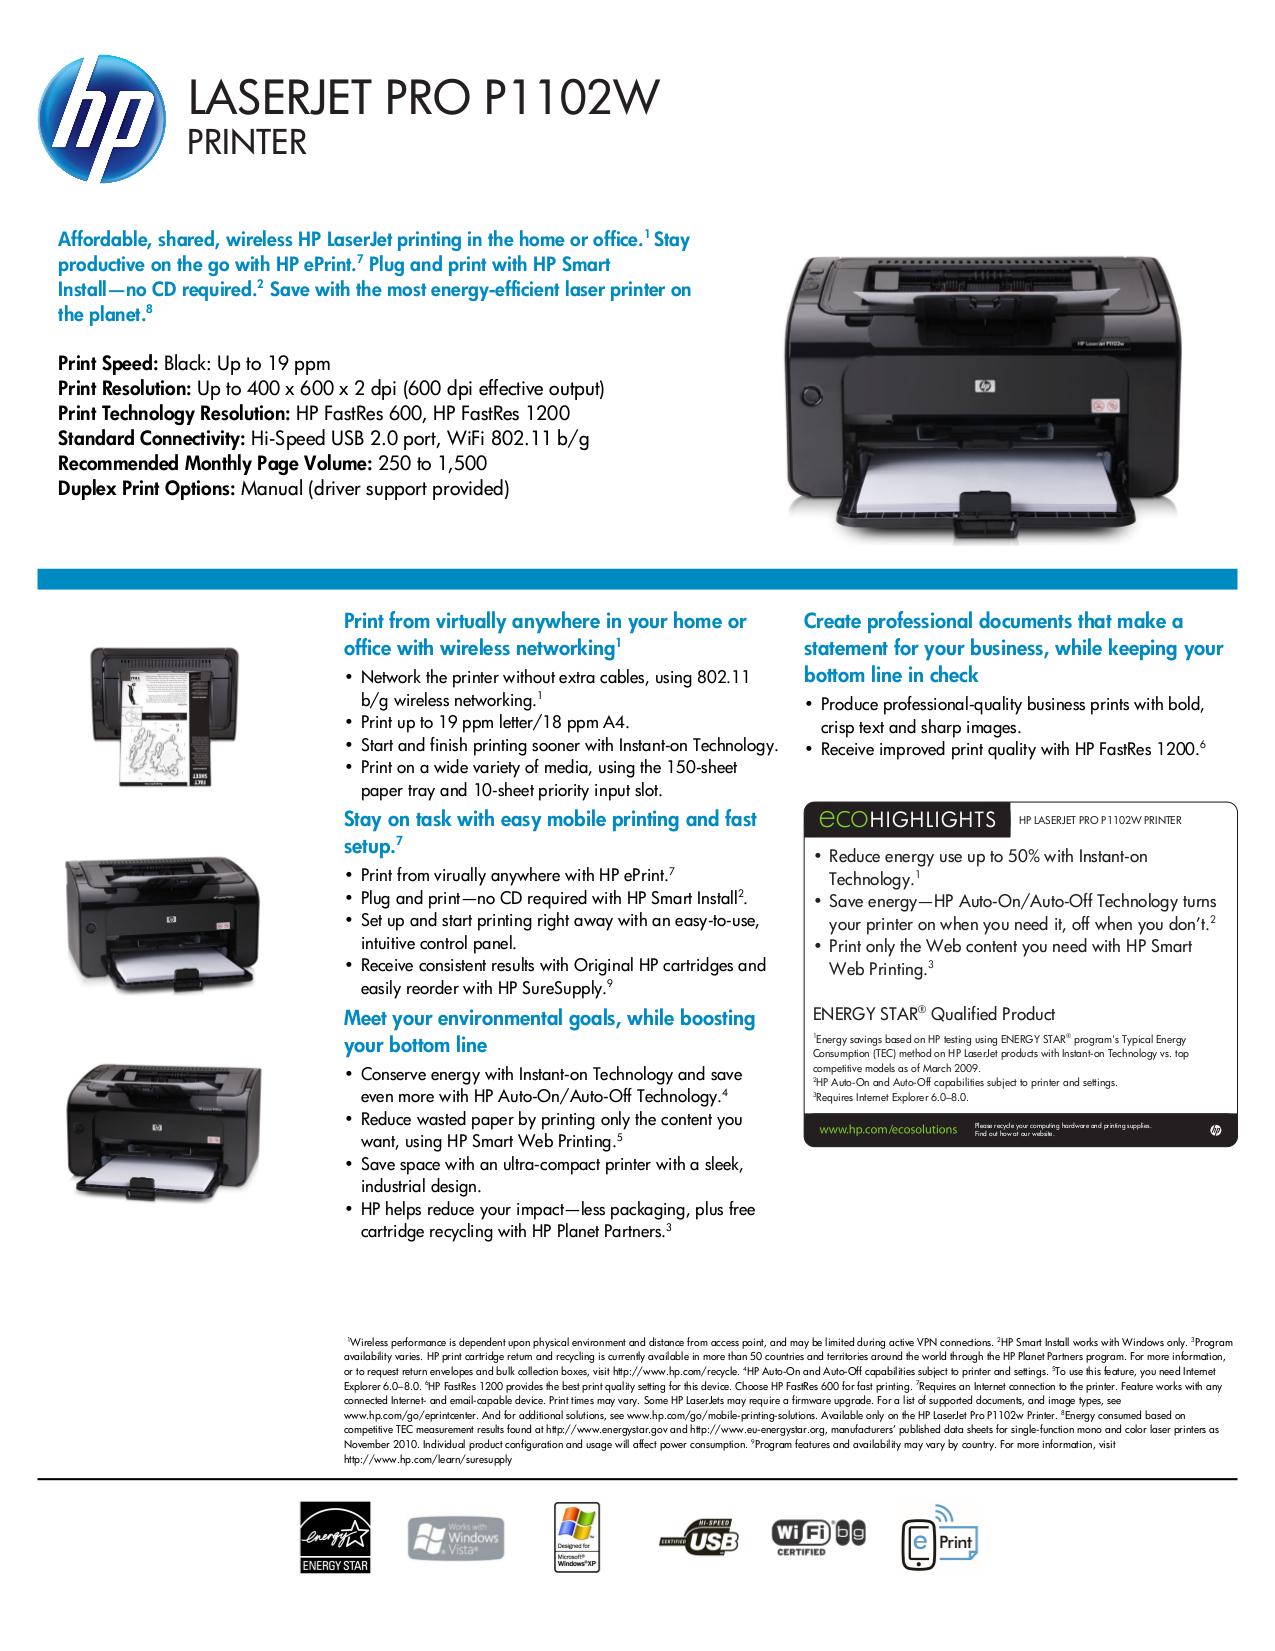 download free pdf for hp laserjet color laserjet pro p1102w printer rh umlib com HP LaserJet P1102w Troubleshooting HP LaserJet P1102w Software Installation